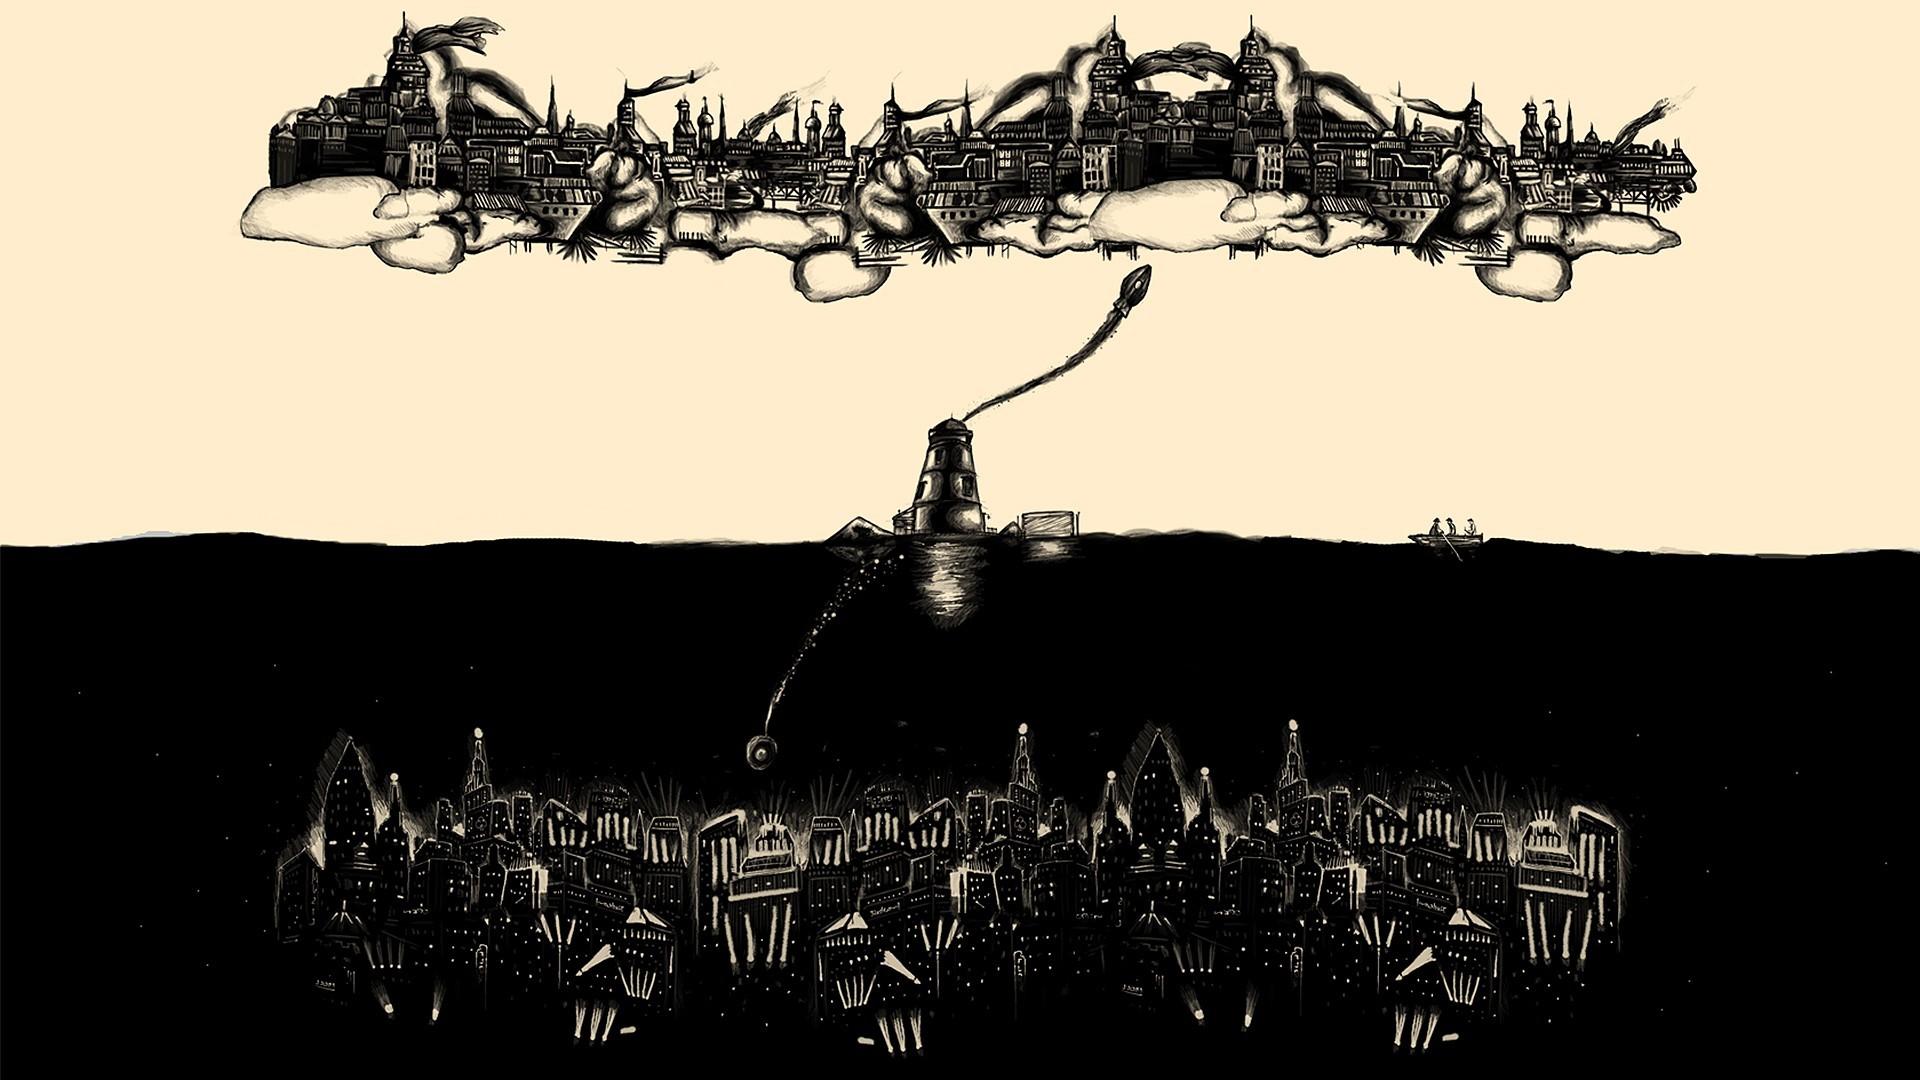 video games, BioShock, Rapture, artwork, fan art, cities .